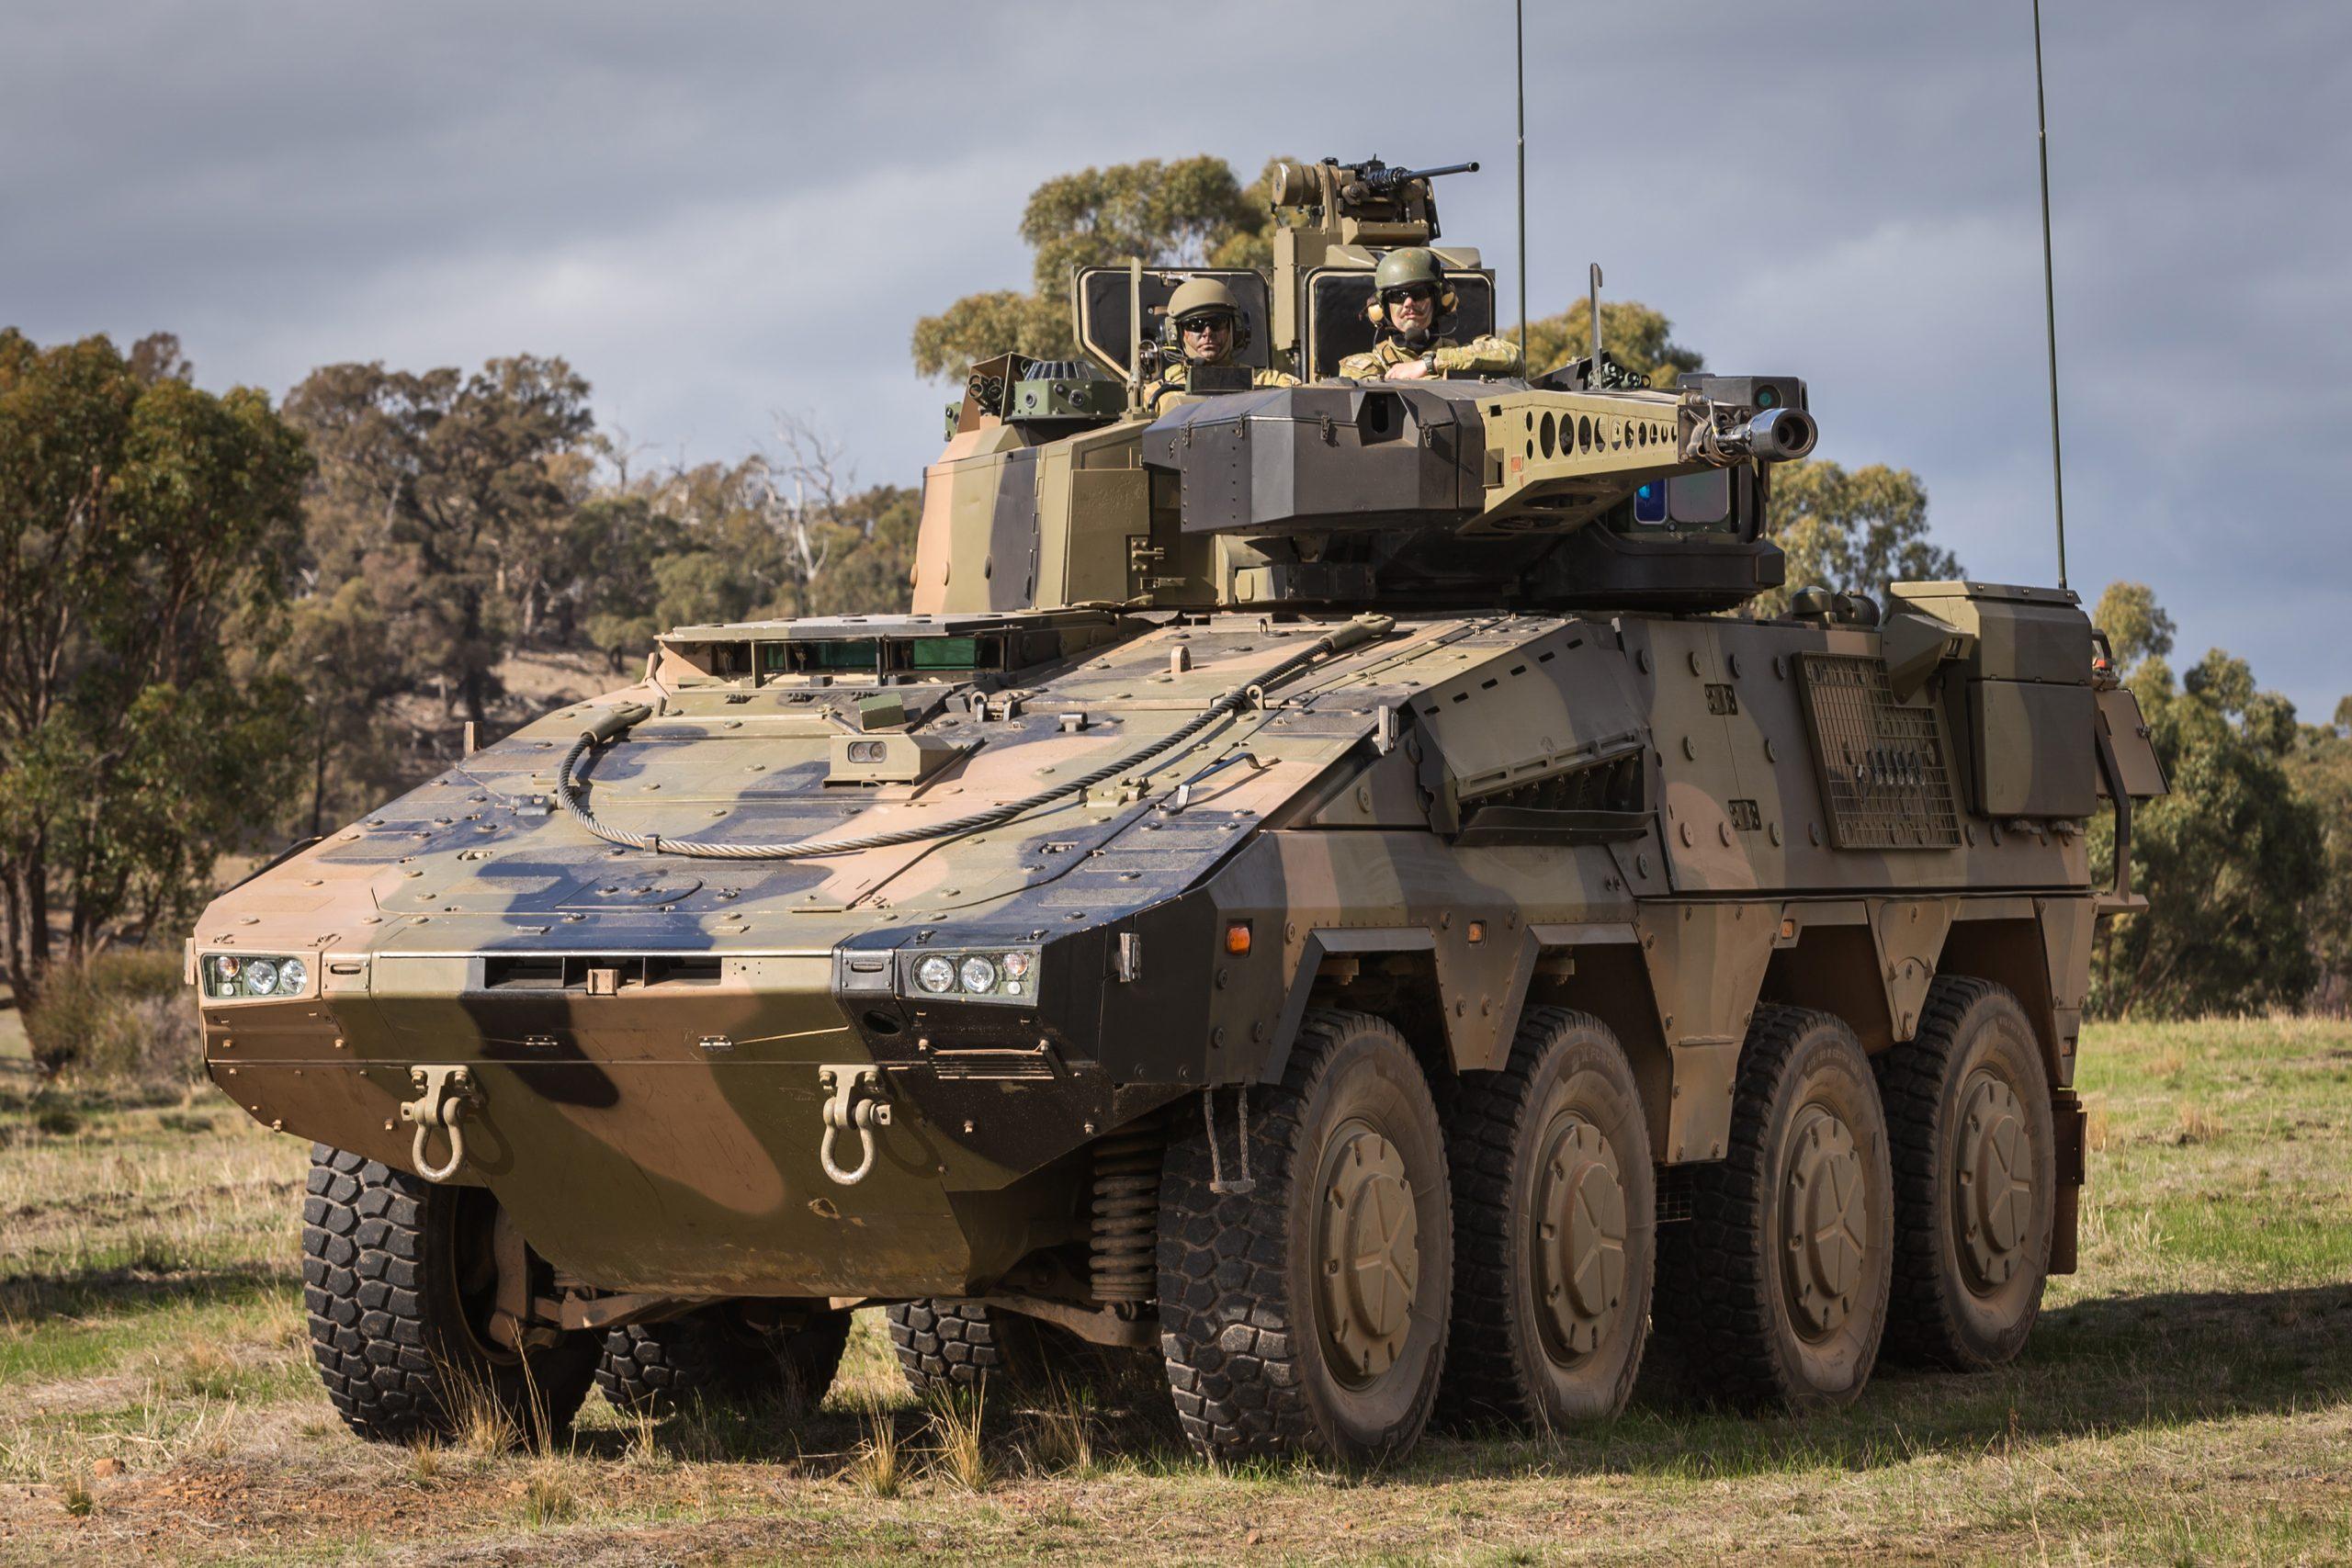 Rheinmetall Boxer 8x8